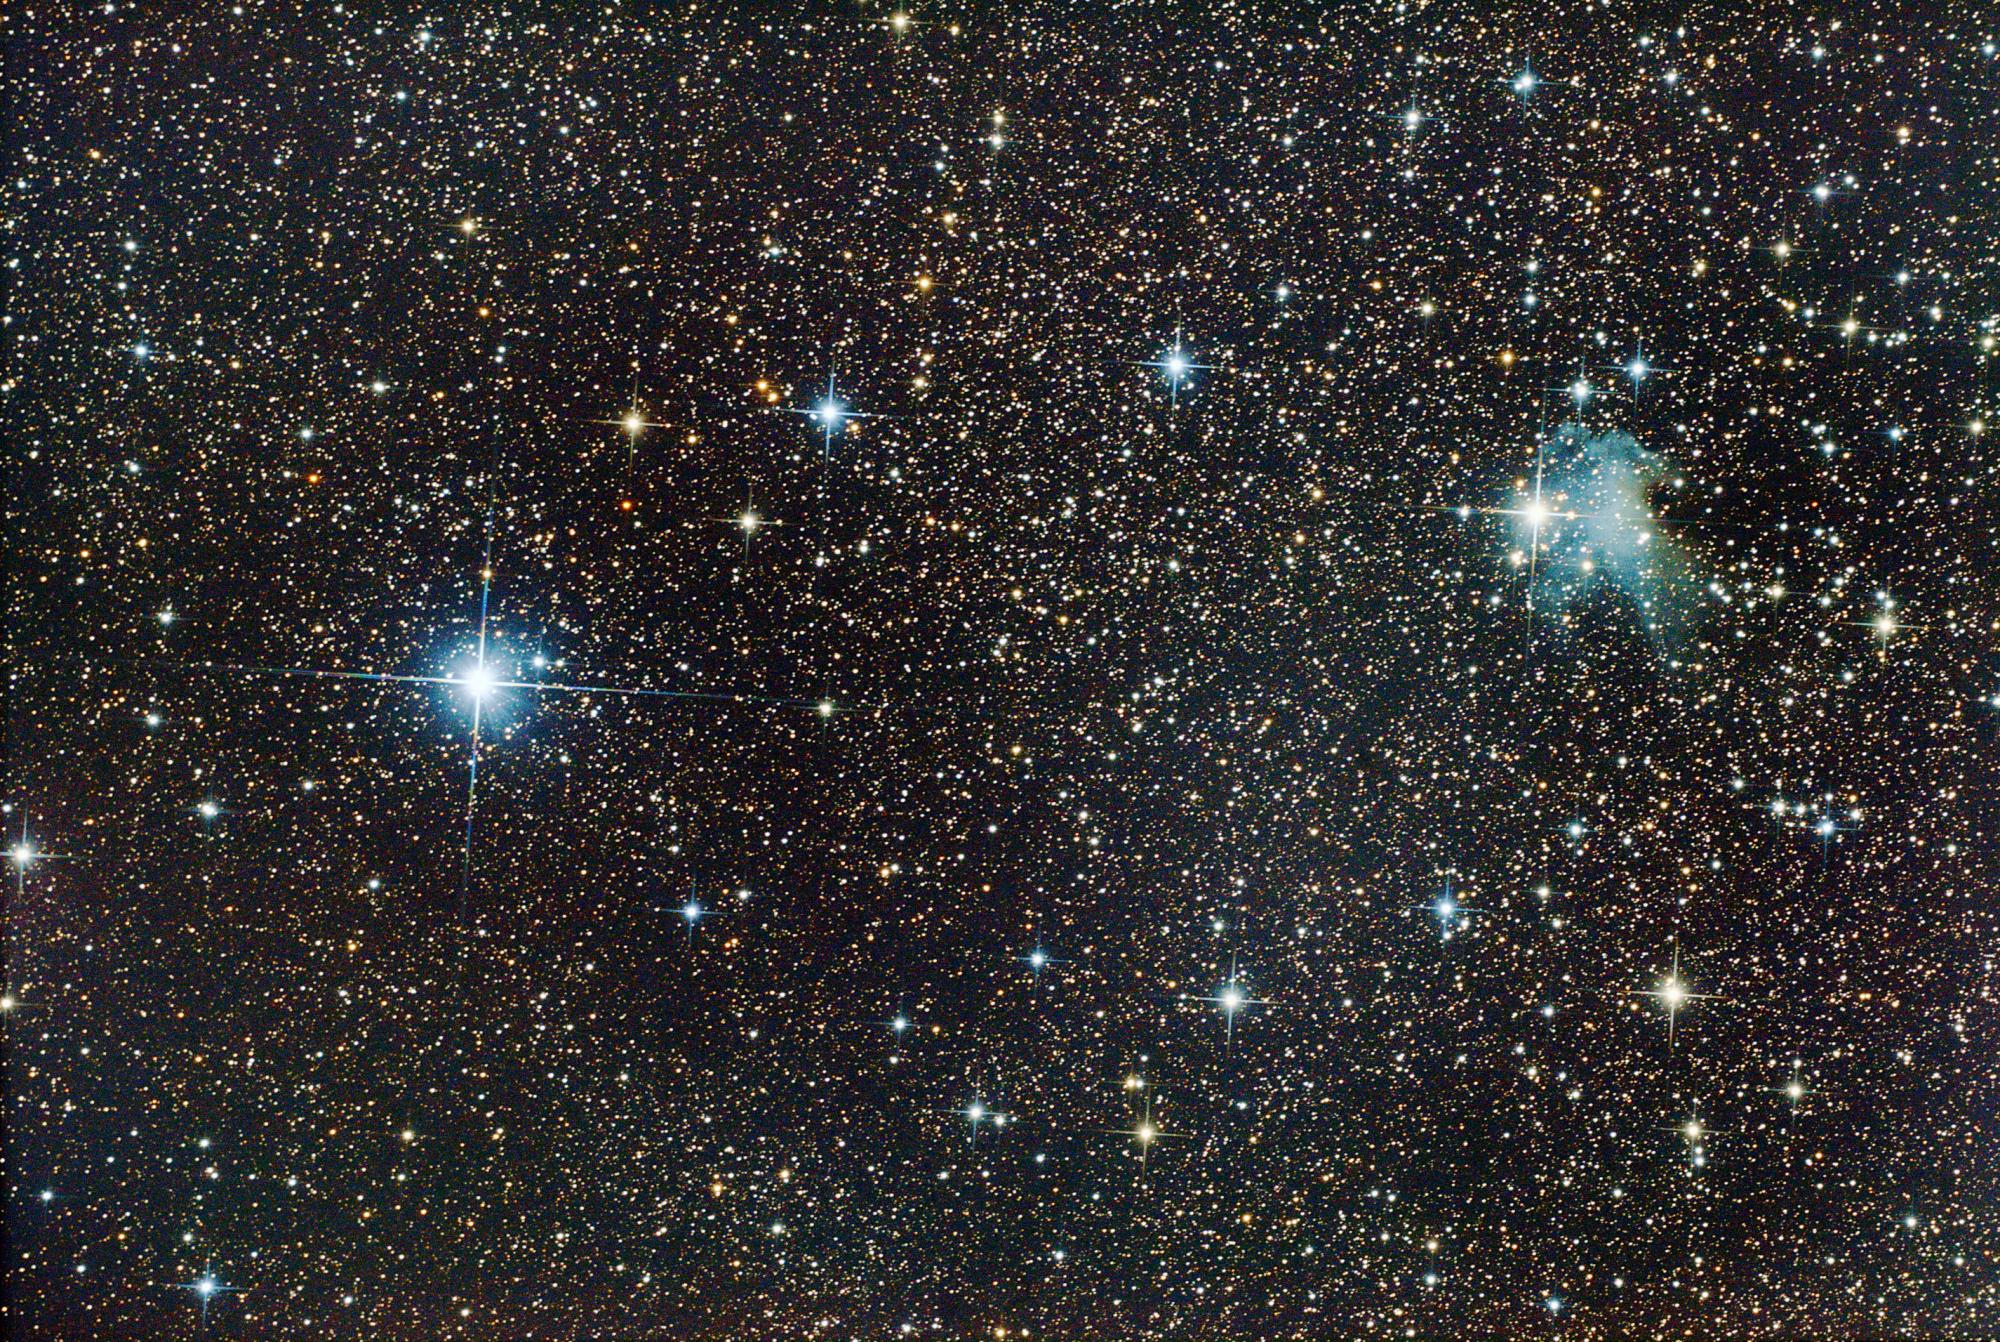 IC5076-II.thumb.jpg.d64258555dc60f9e9adfd8efb88d237e.jpg